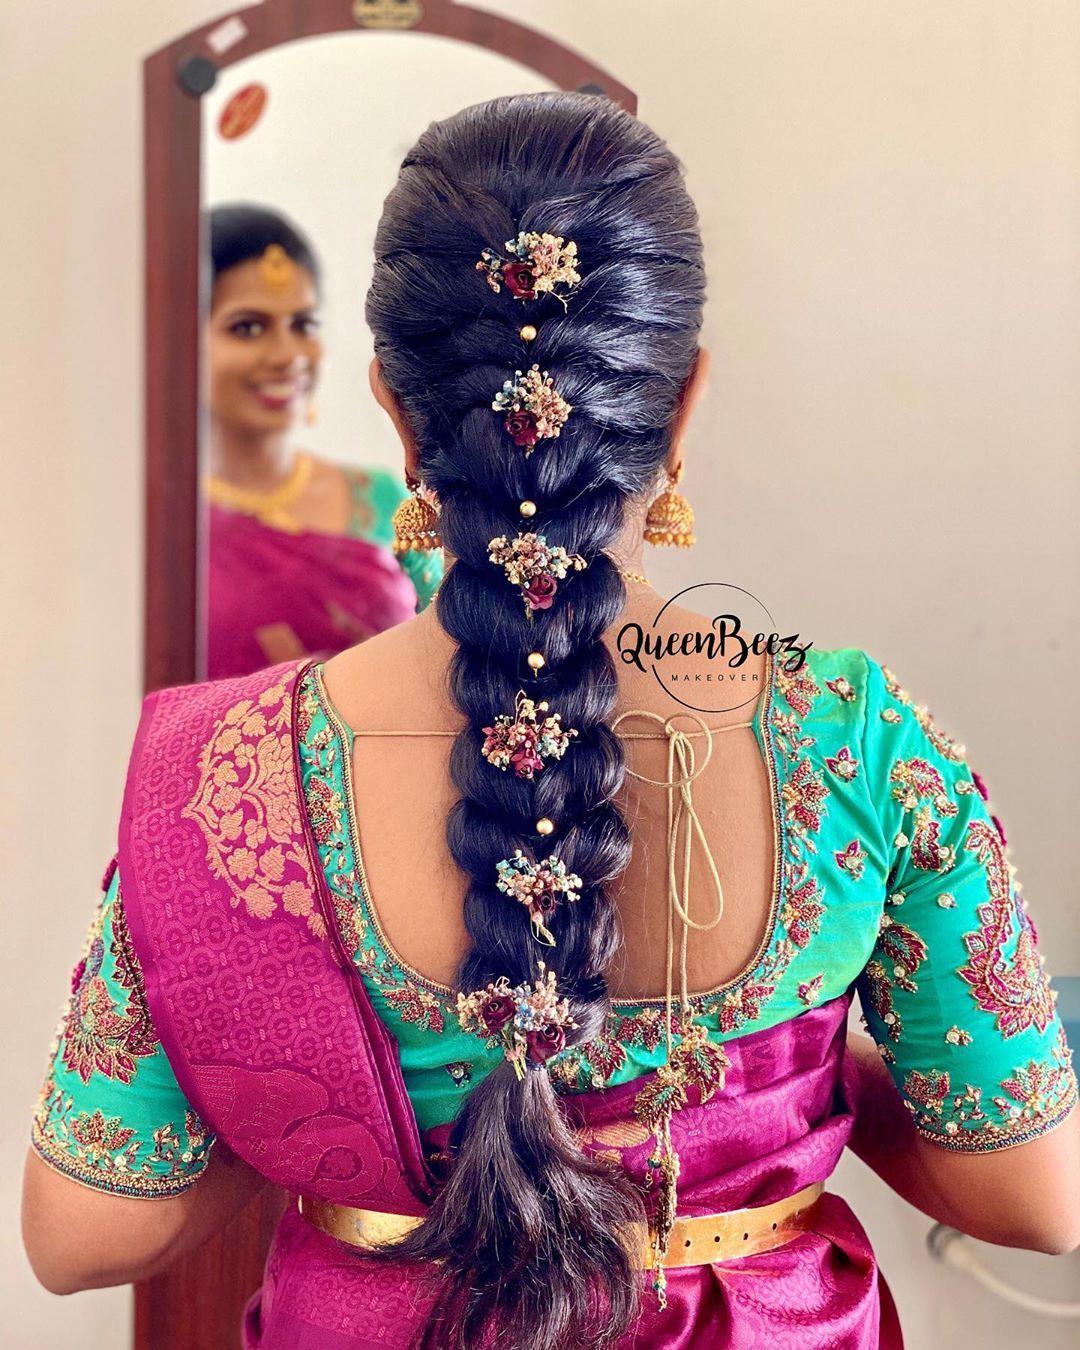 980 Likes 4 Comments Qᴜᴇᴇɴbᴇᴇᴢ ʙʏ Nᴀɴᴅʜɪɴɪ Rᴀᴊᴀ Queenbeezmakeover On Instagram Neat Sl Hair Styles Indian Bride Hairstyle Engagement Hairstyles